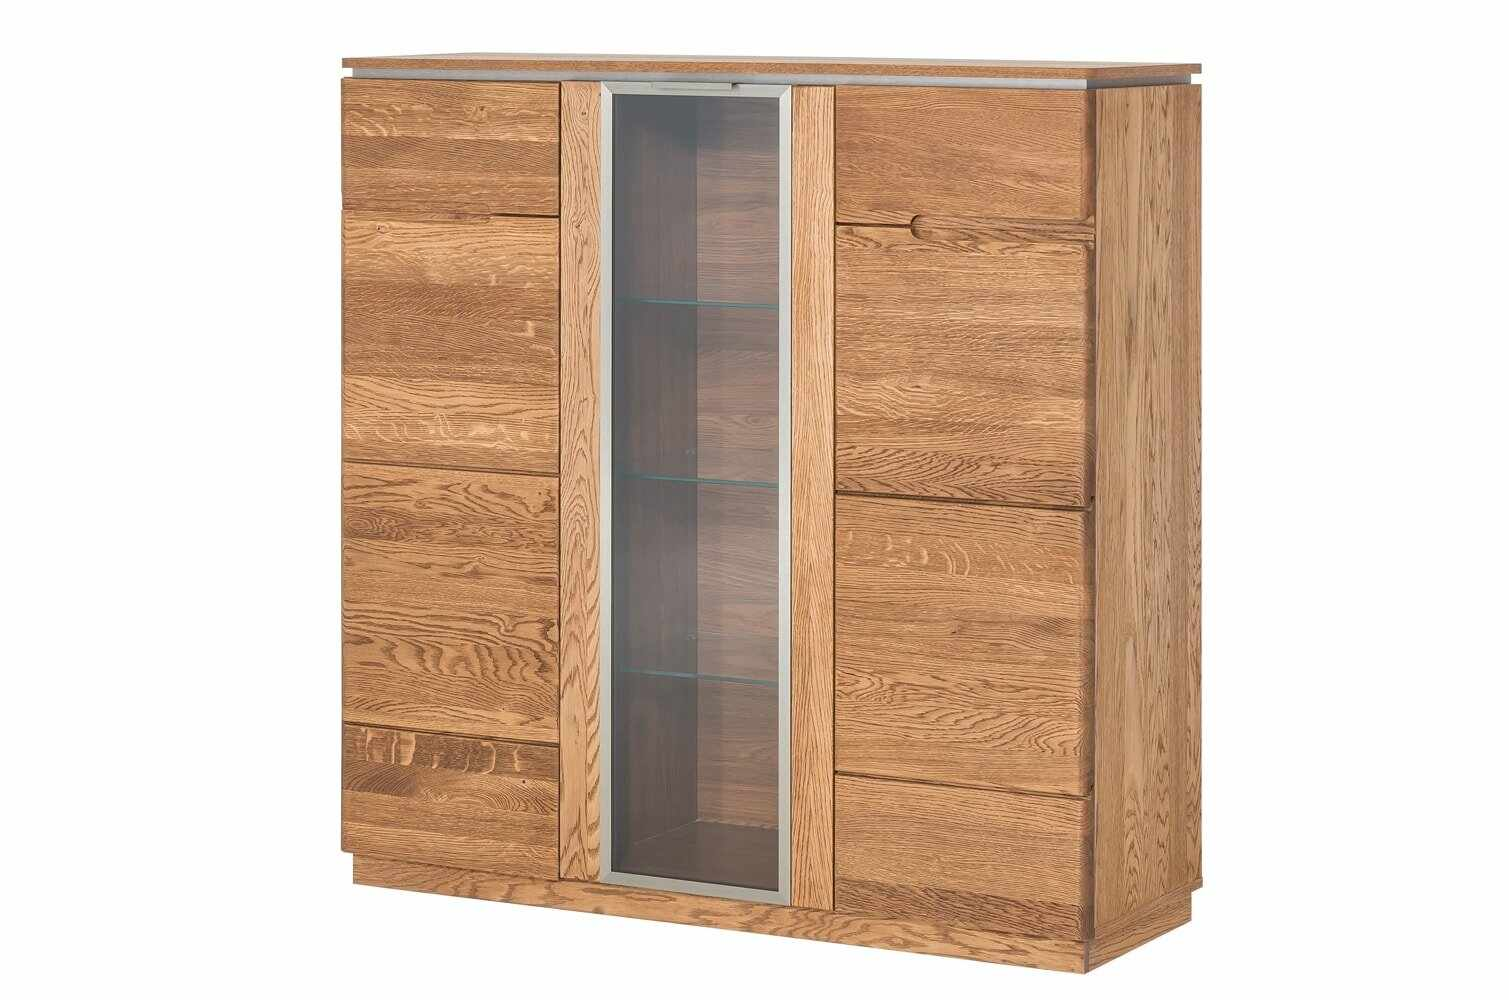 Dulap cu vitrina din lemn si furnir, cu 3 usi Montenegro 48 Stejar Rustic, l120xA42xH125 cm la pret 3225 lei